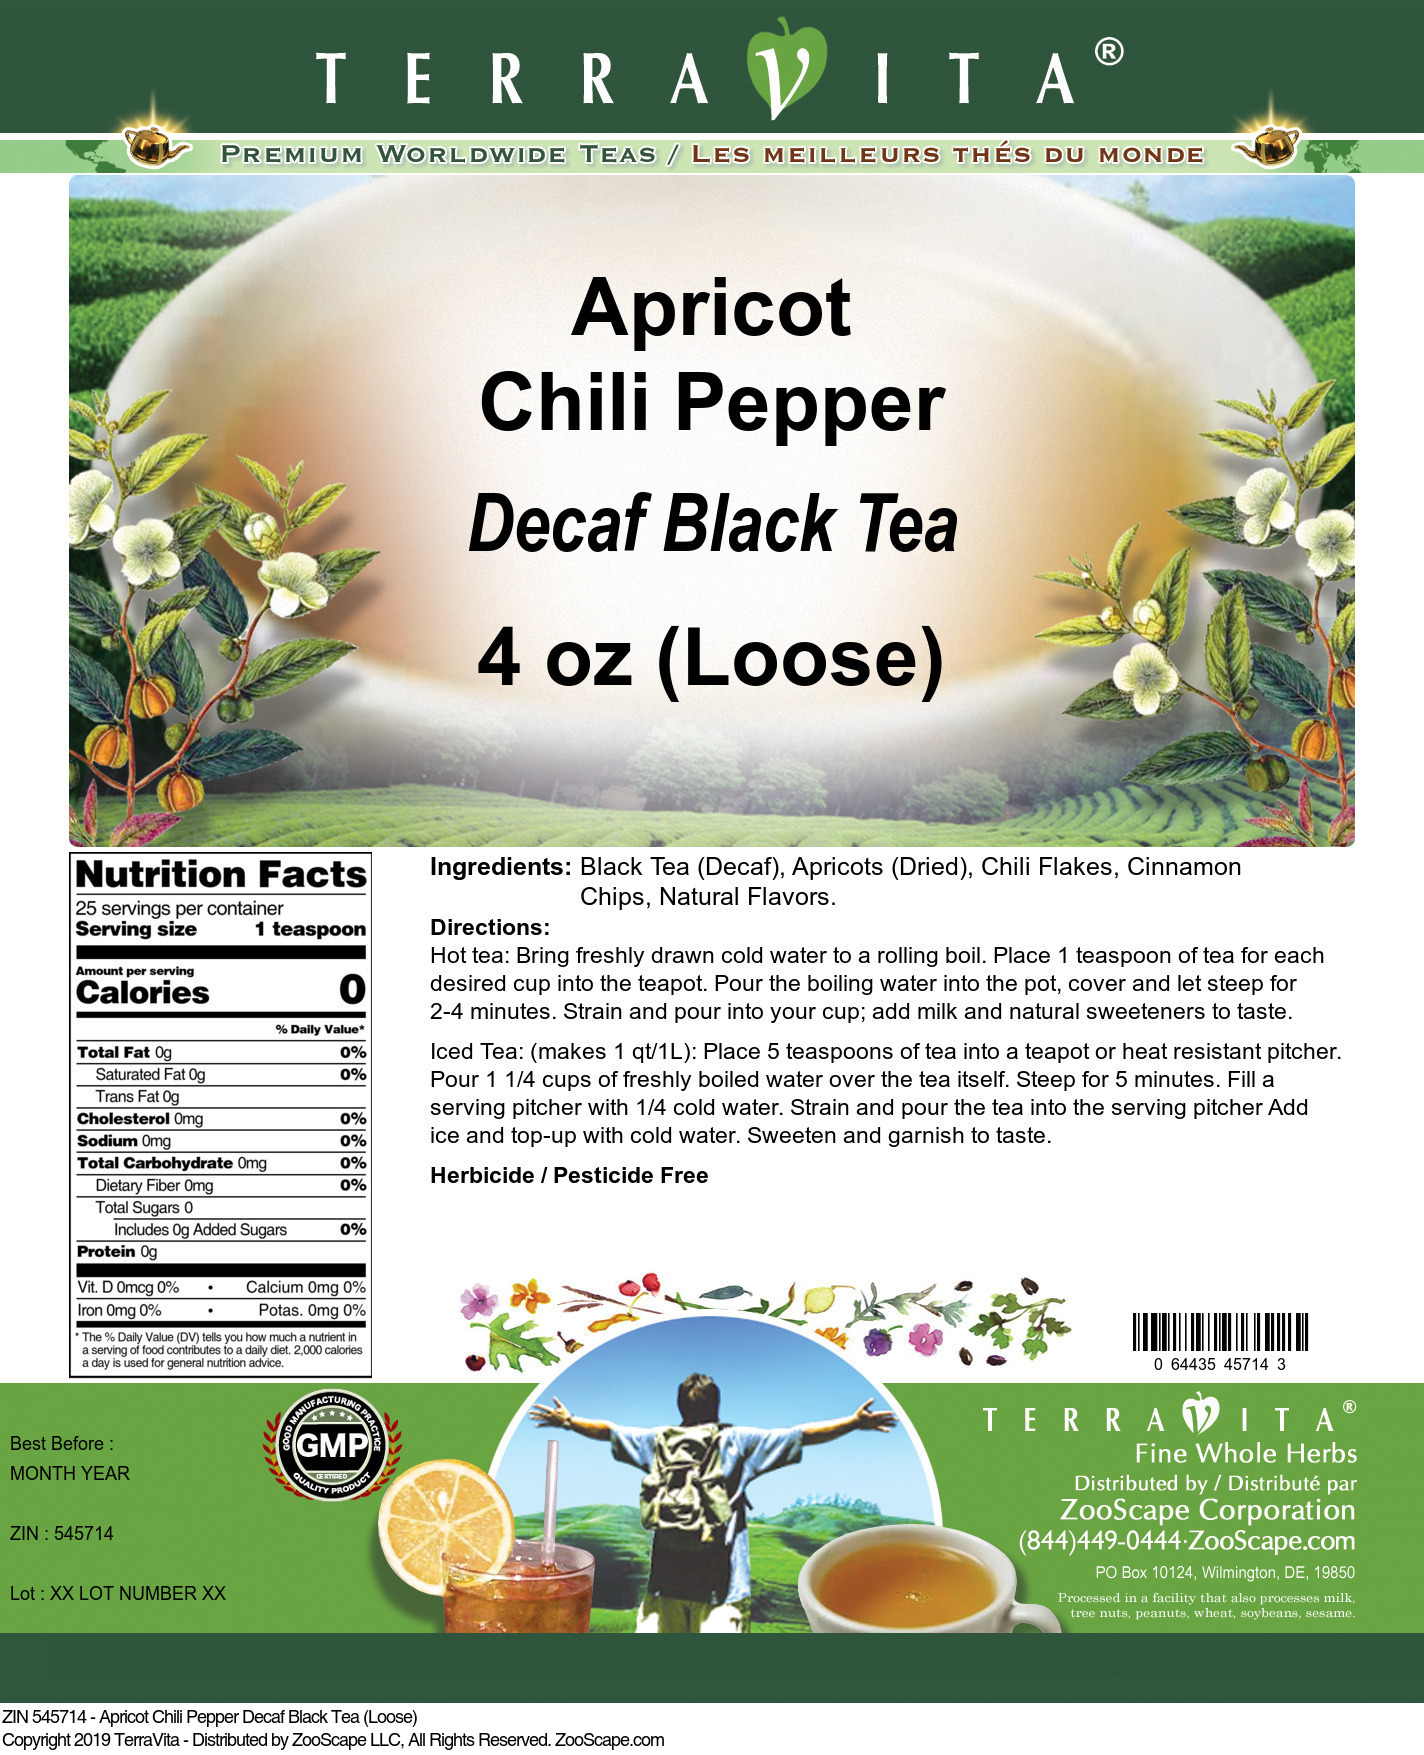 Apricot Chili Pepper Decaf Black Tea